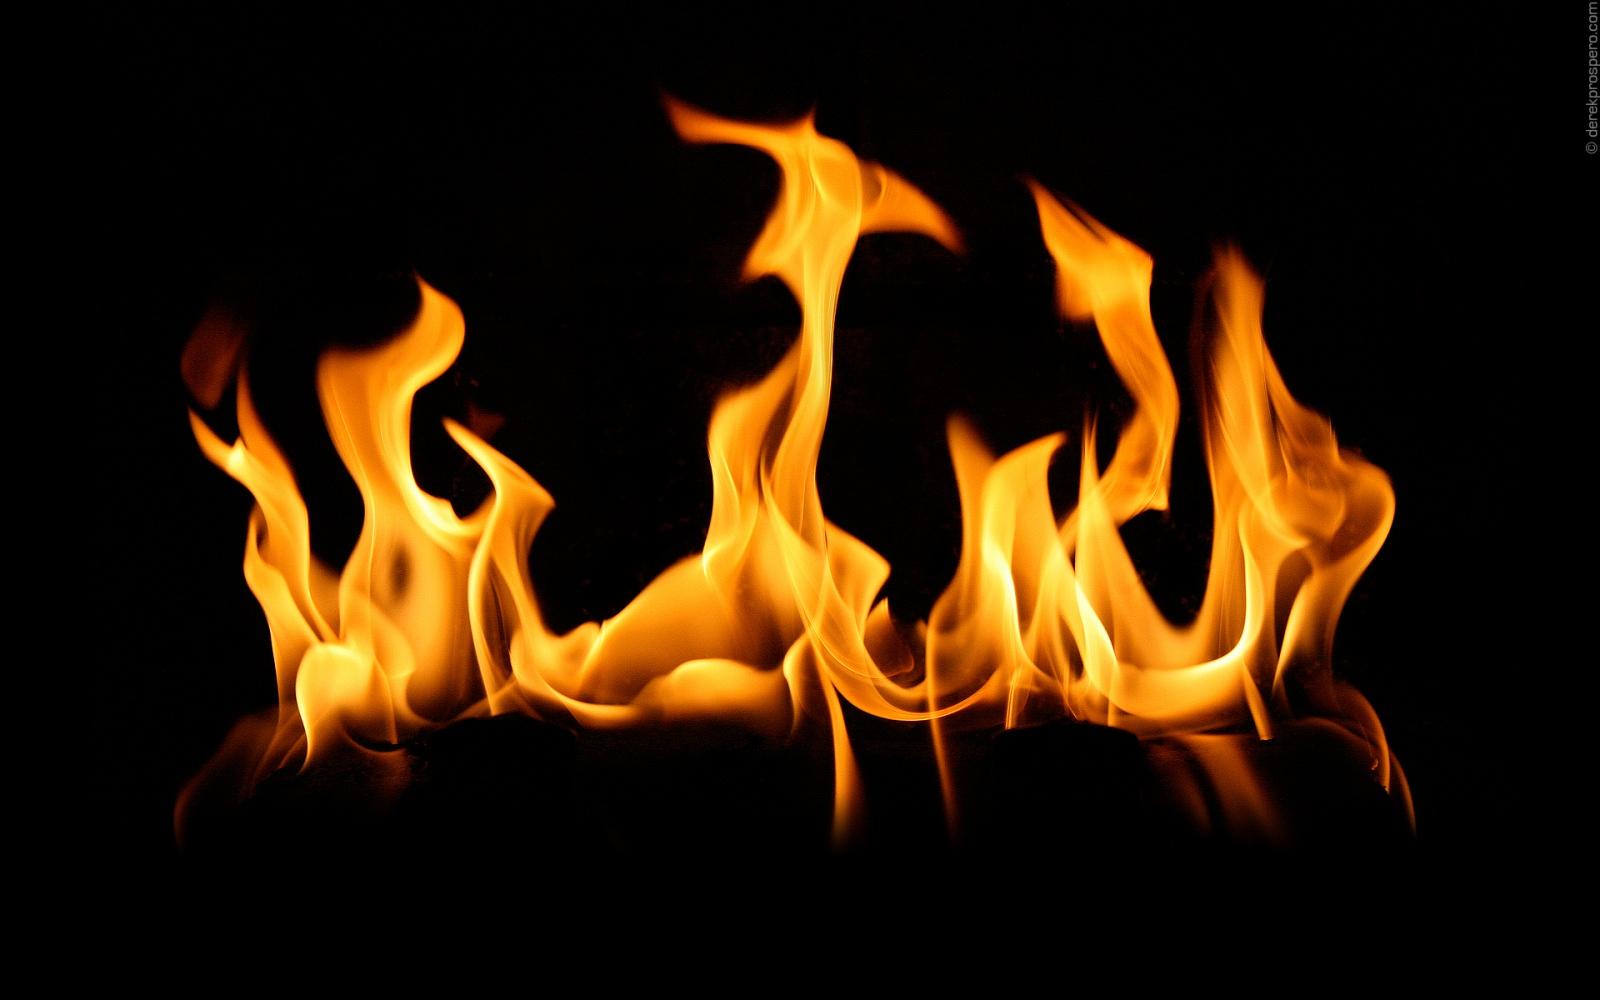 http://1.bp.blogspot.com/-is0ZJ37F3AY/T1pCGtLcVbI/AAAAAAAACAo/Dm1fuMdiiZk/s1600/ws_Fire_Flames_1600x1200+(1).jpg